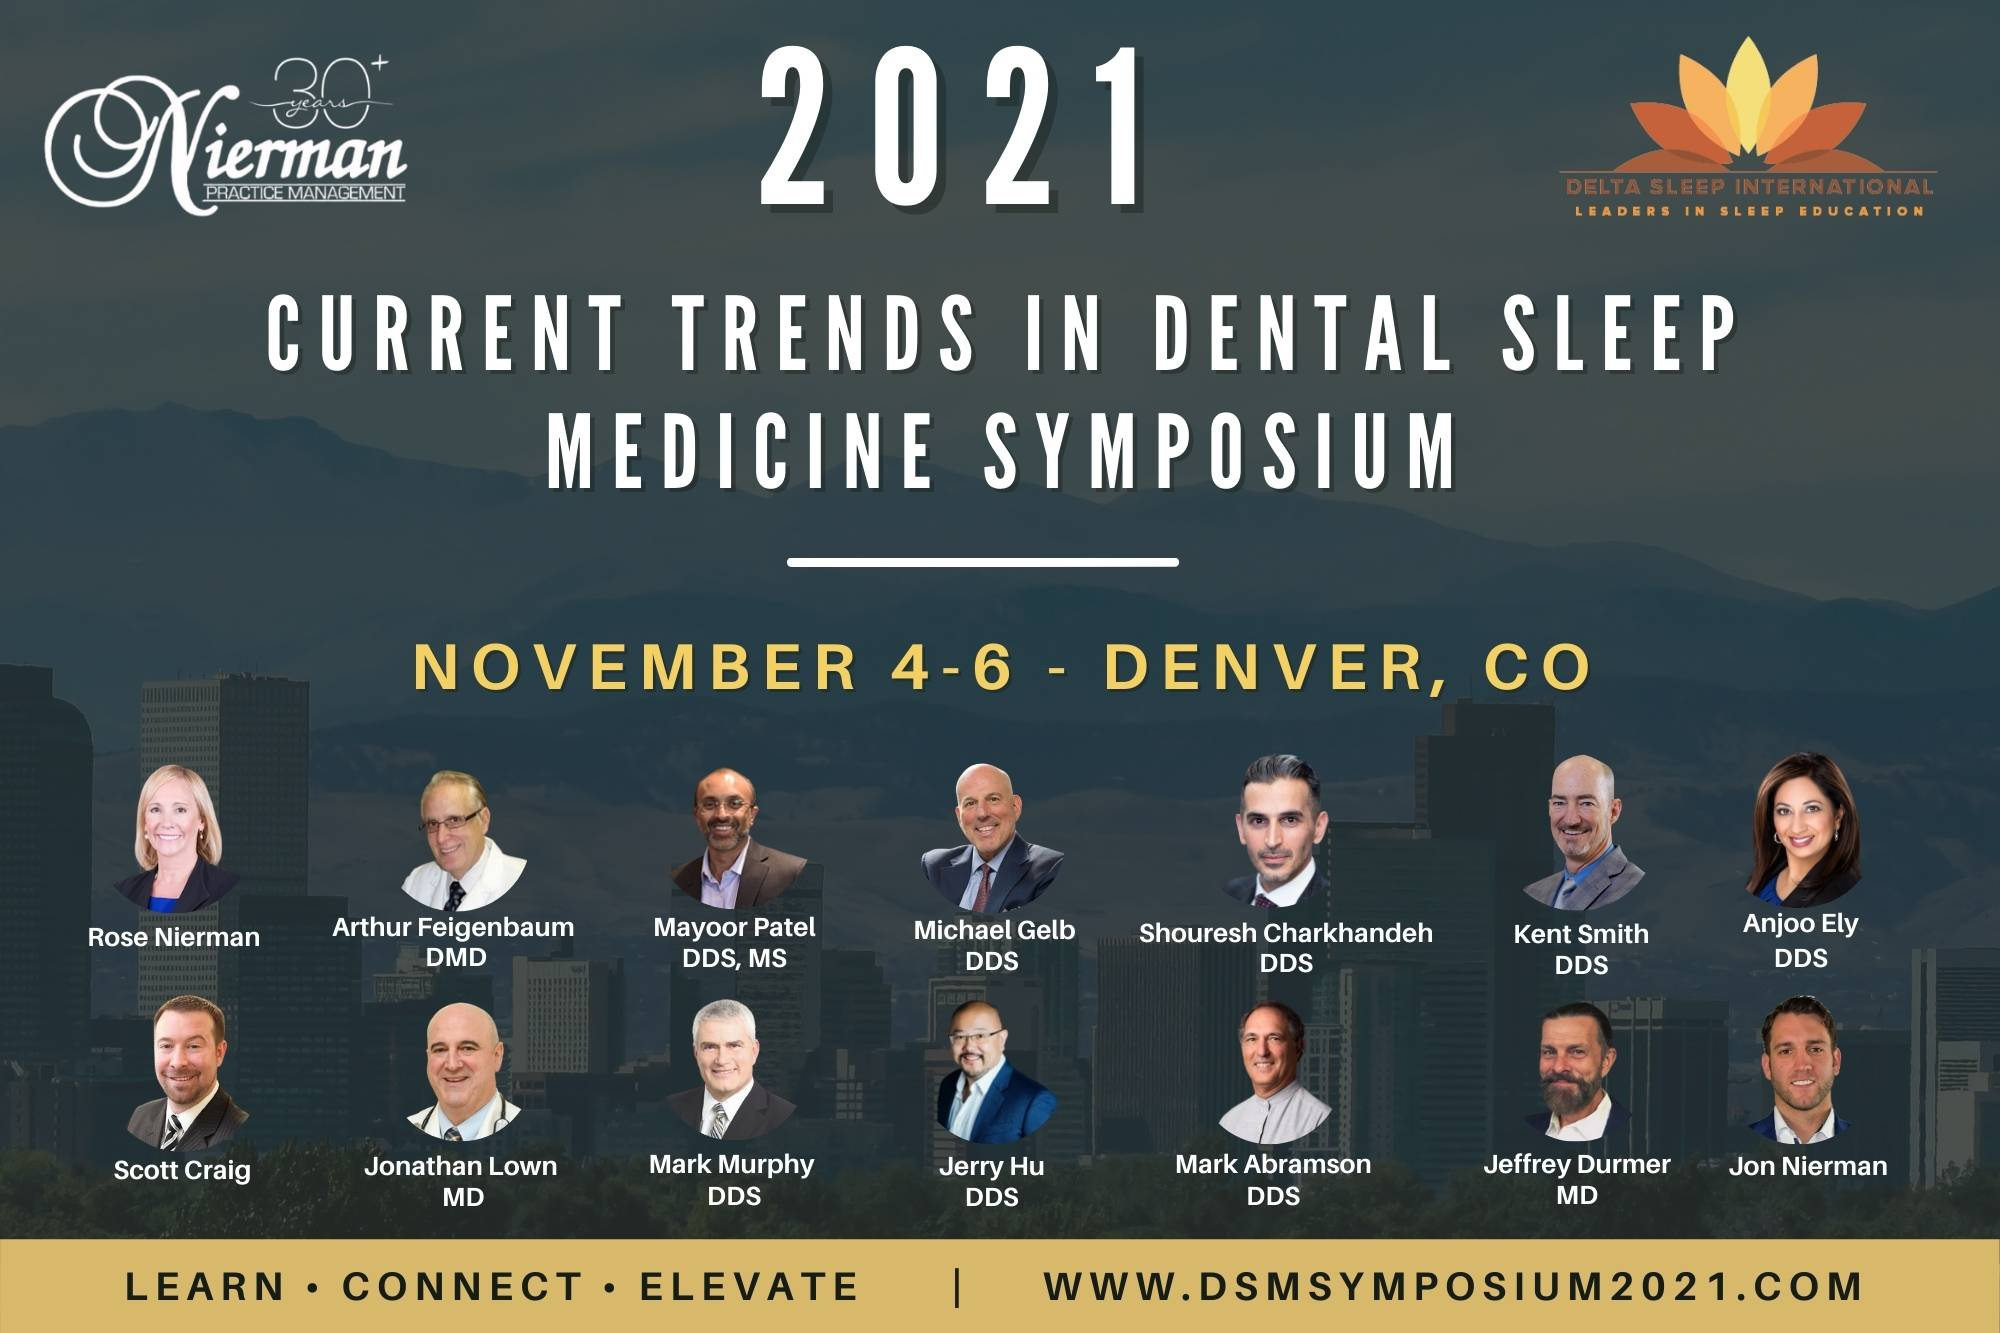 2021 Current Trends in Dental Sleep Symposium